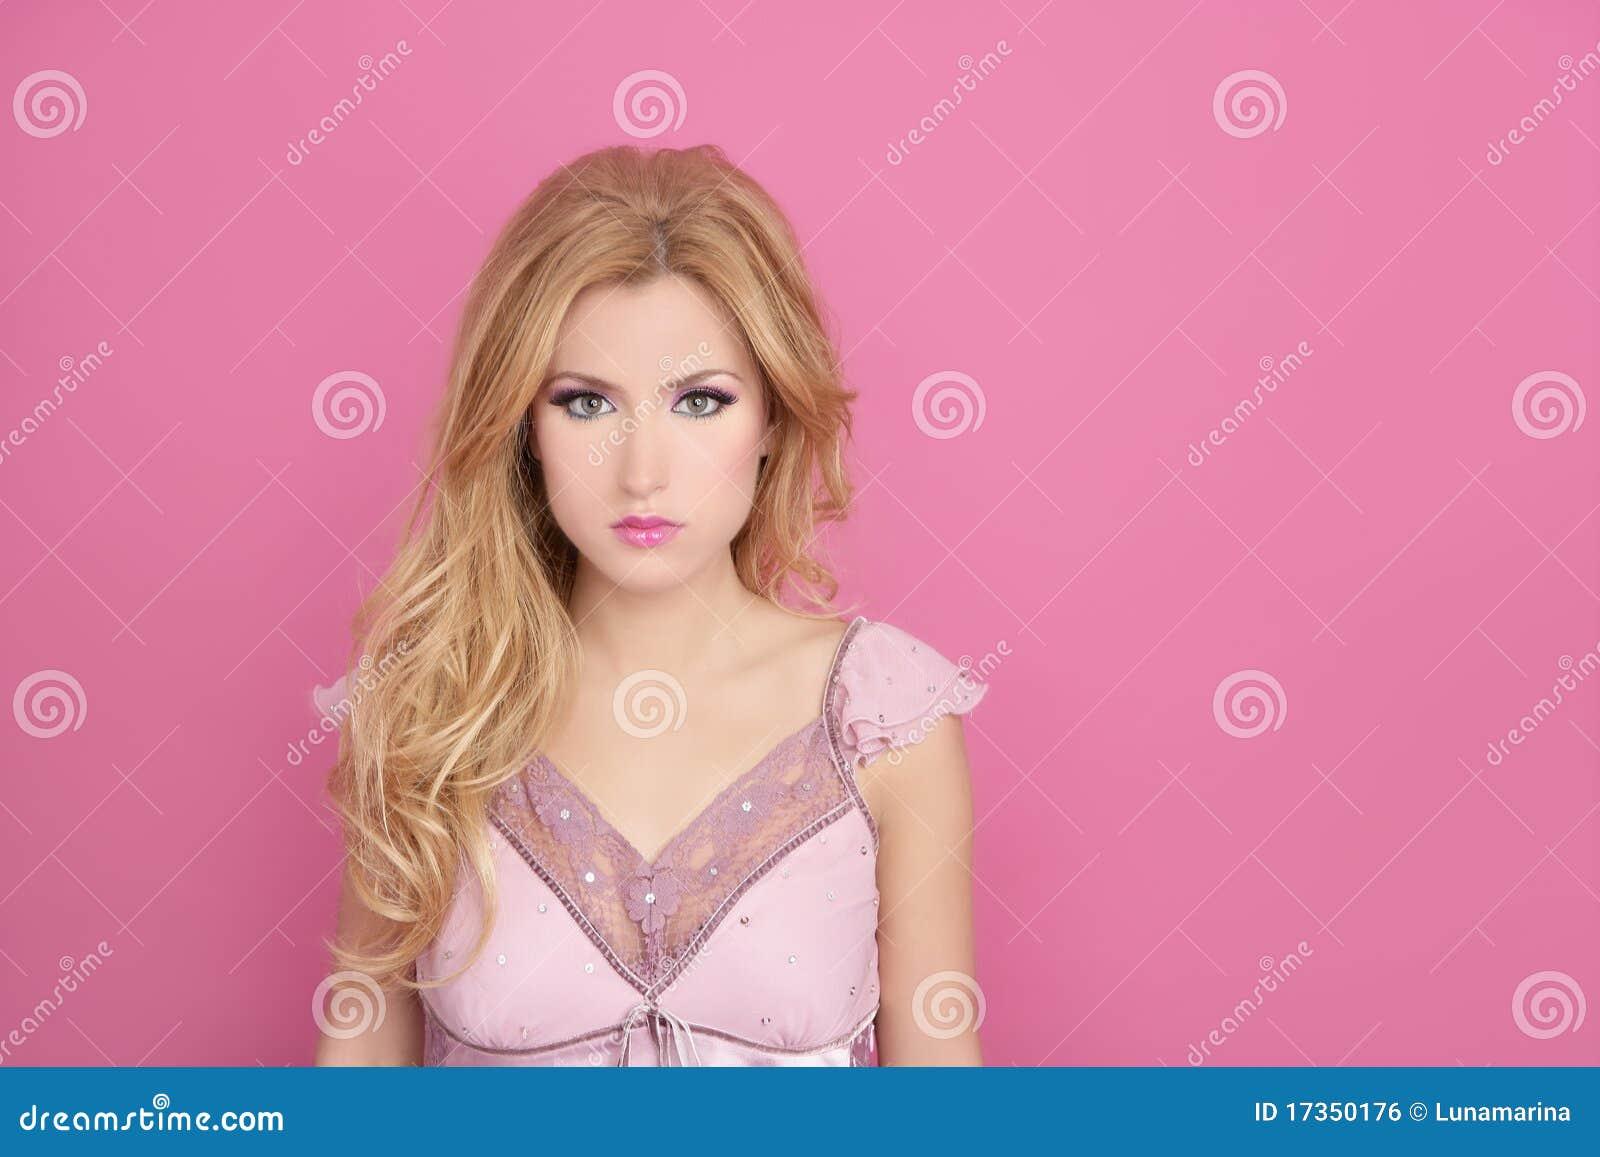 Fashion Romantic Blonde Pink Barbie Doll Style Stock Photo Image